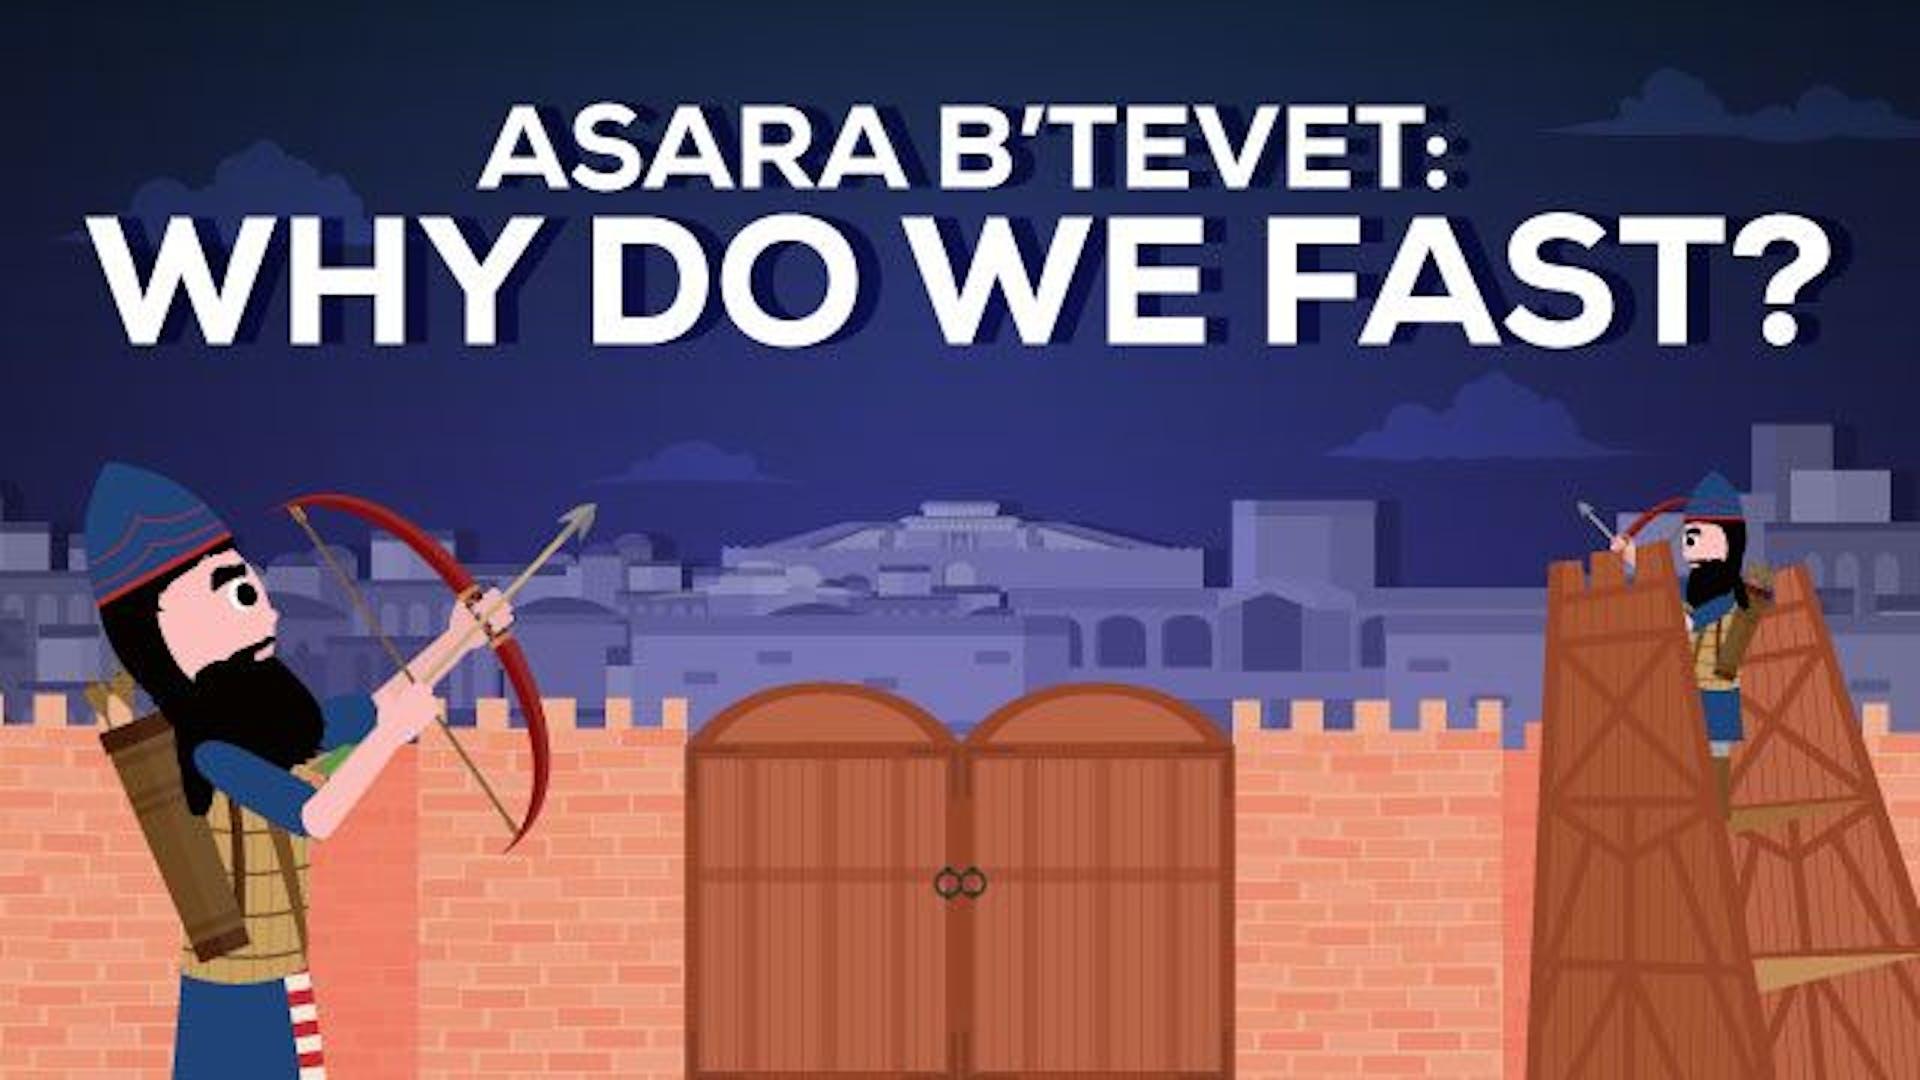 Asarah b'Tevet Bible story